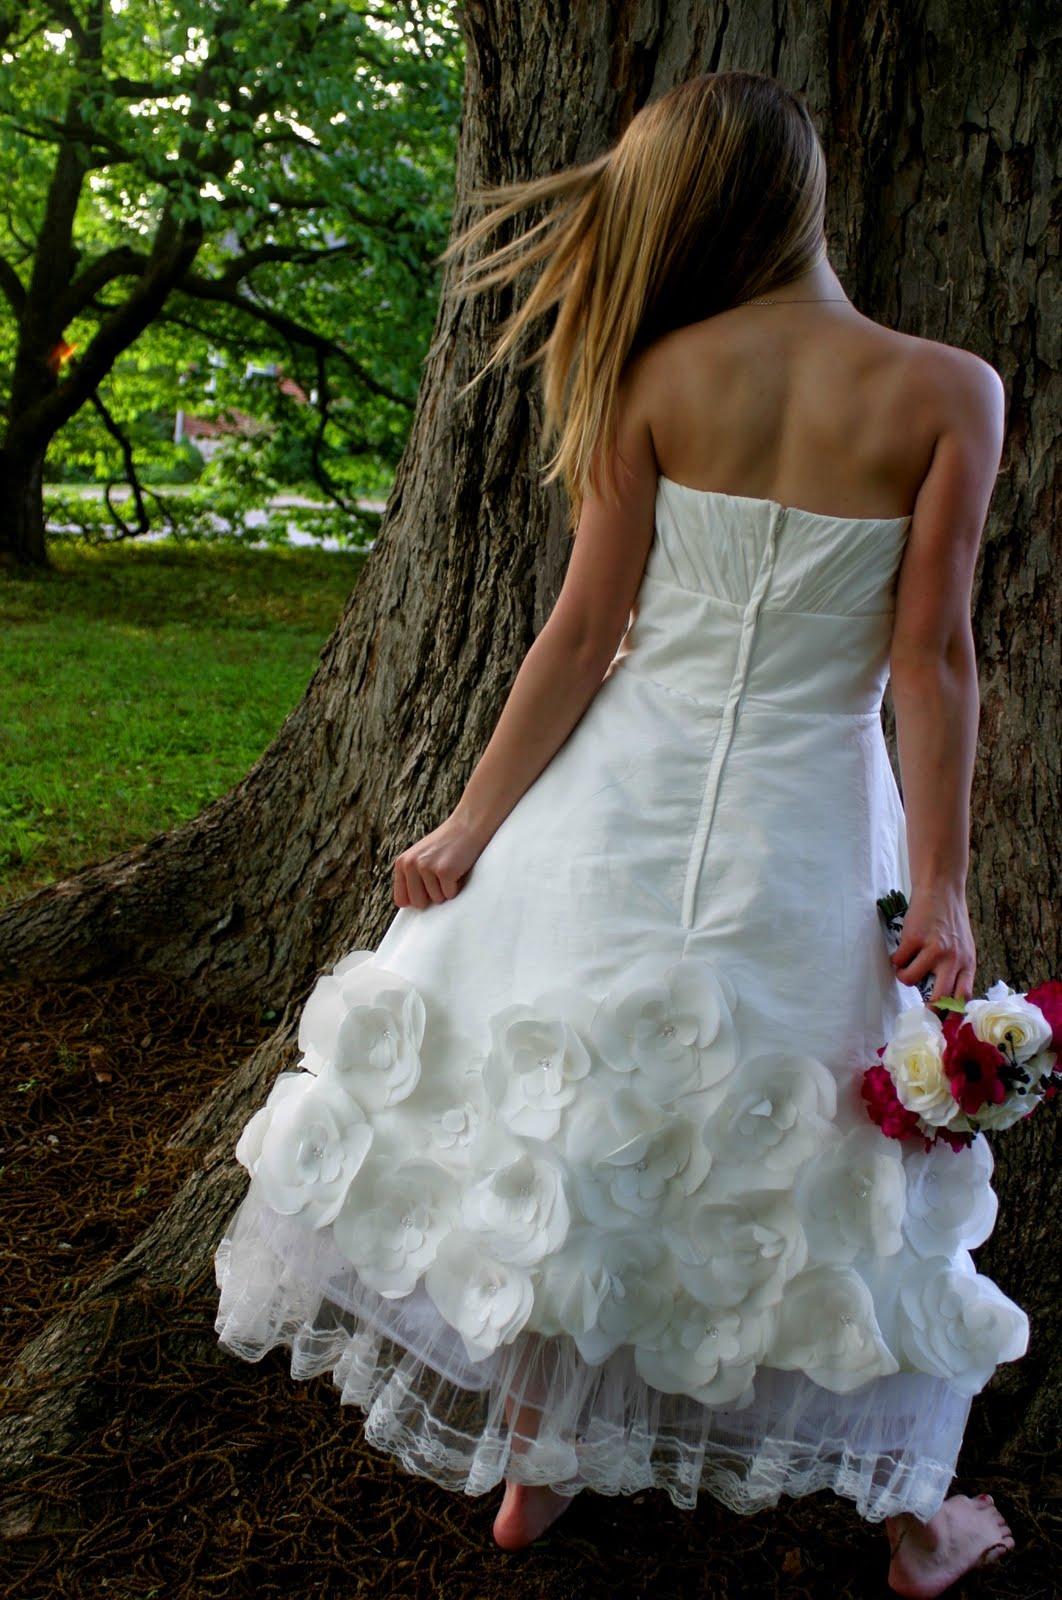 Ashlee proffitt design wedding gowns fairy tale wedding for Fairy tale wedding dresses